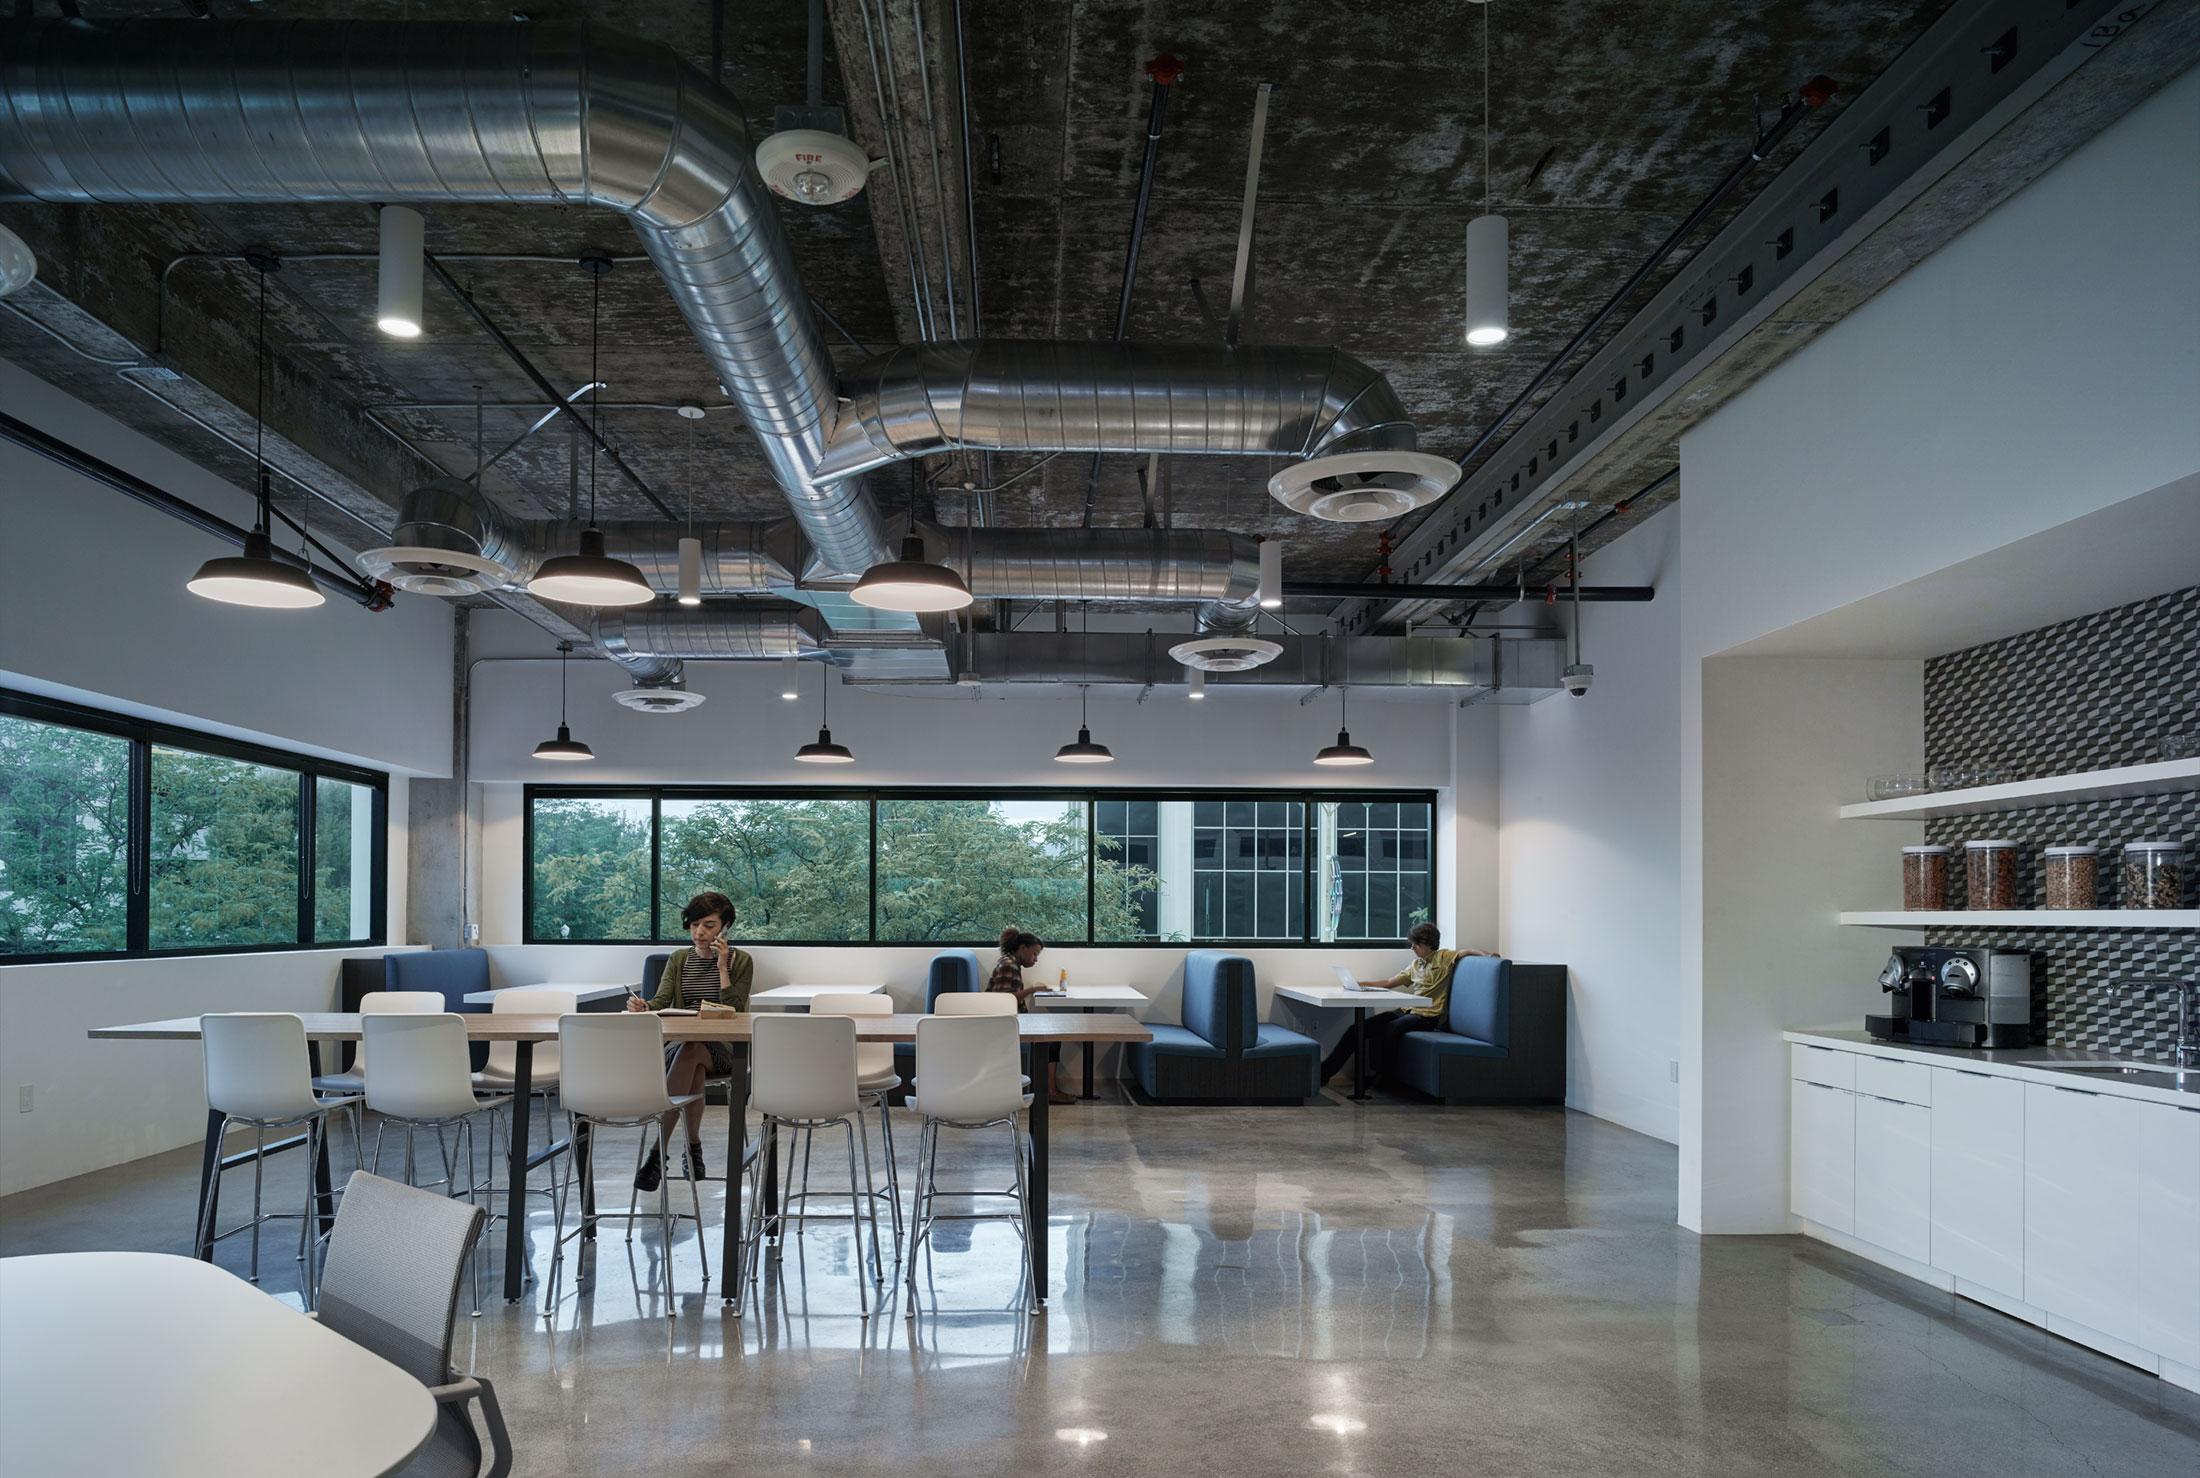 modern-architecture-commercial-interiors-workplace-office-custom-fabrication-california-shubindonaldson-cim-headquarters-05